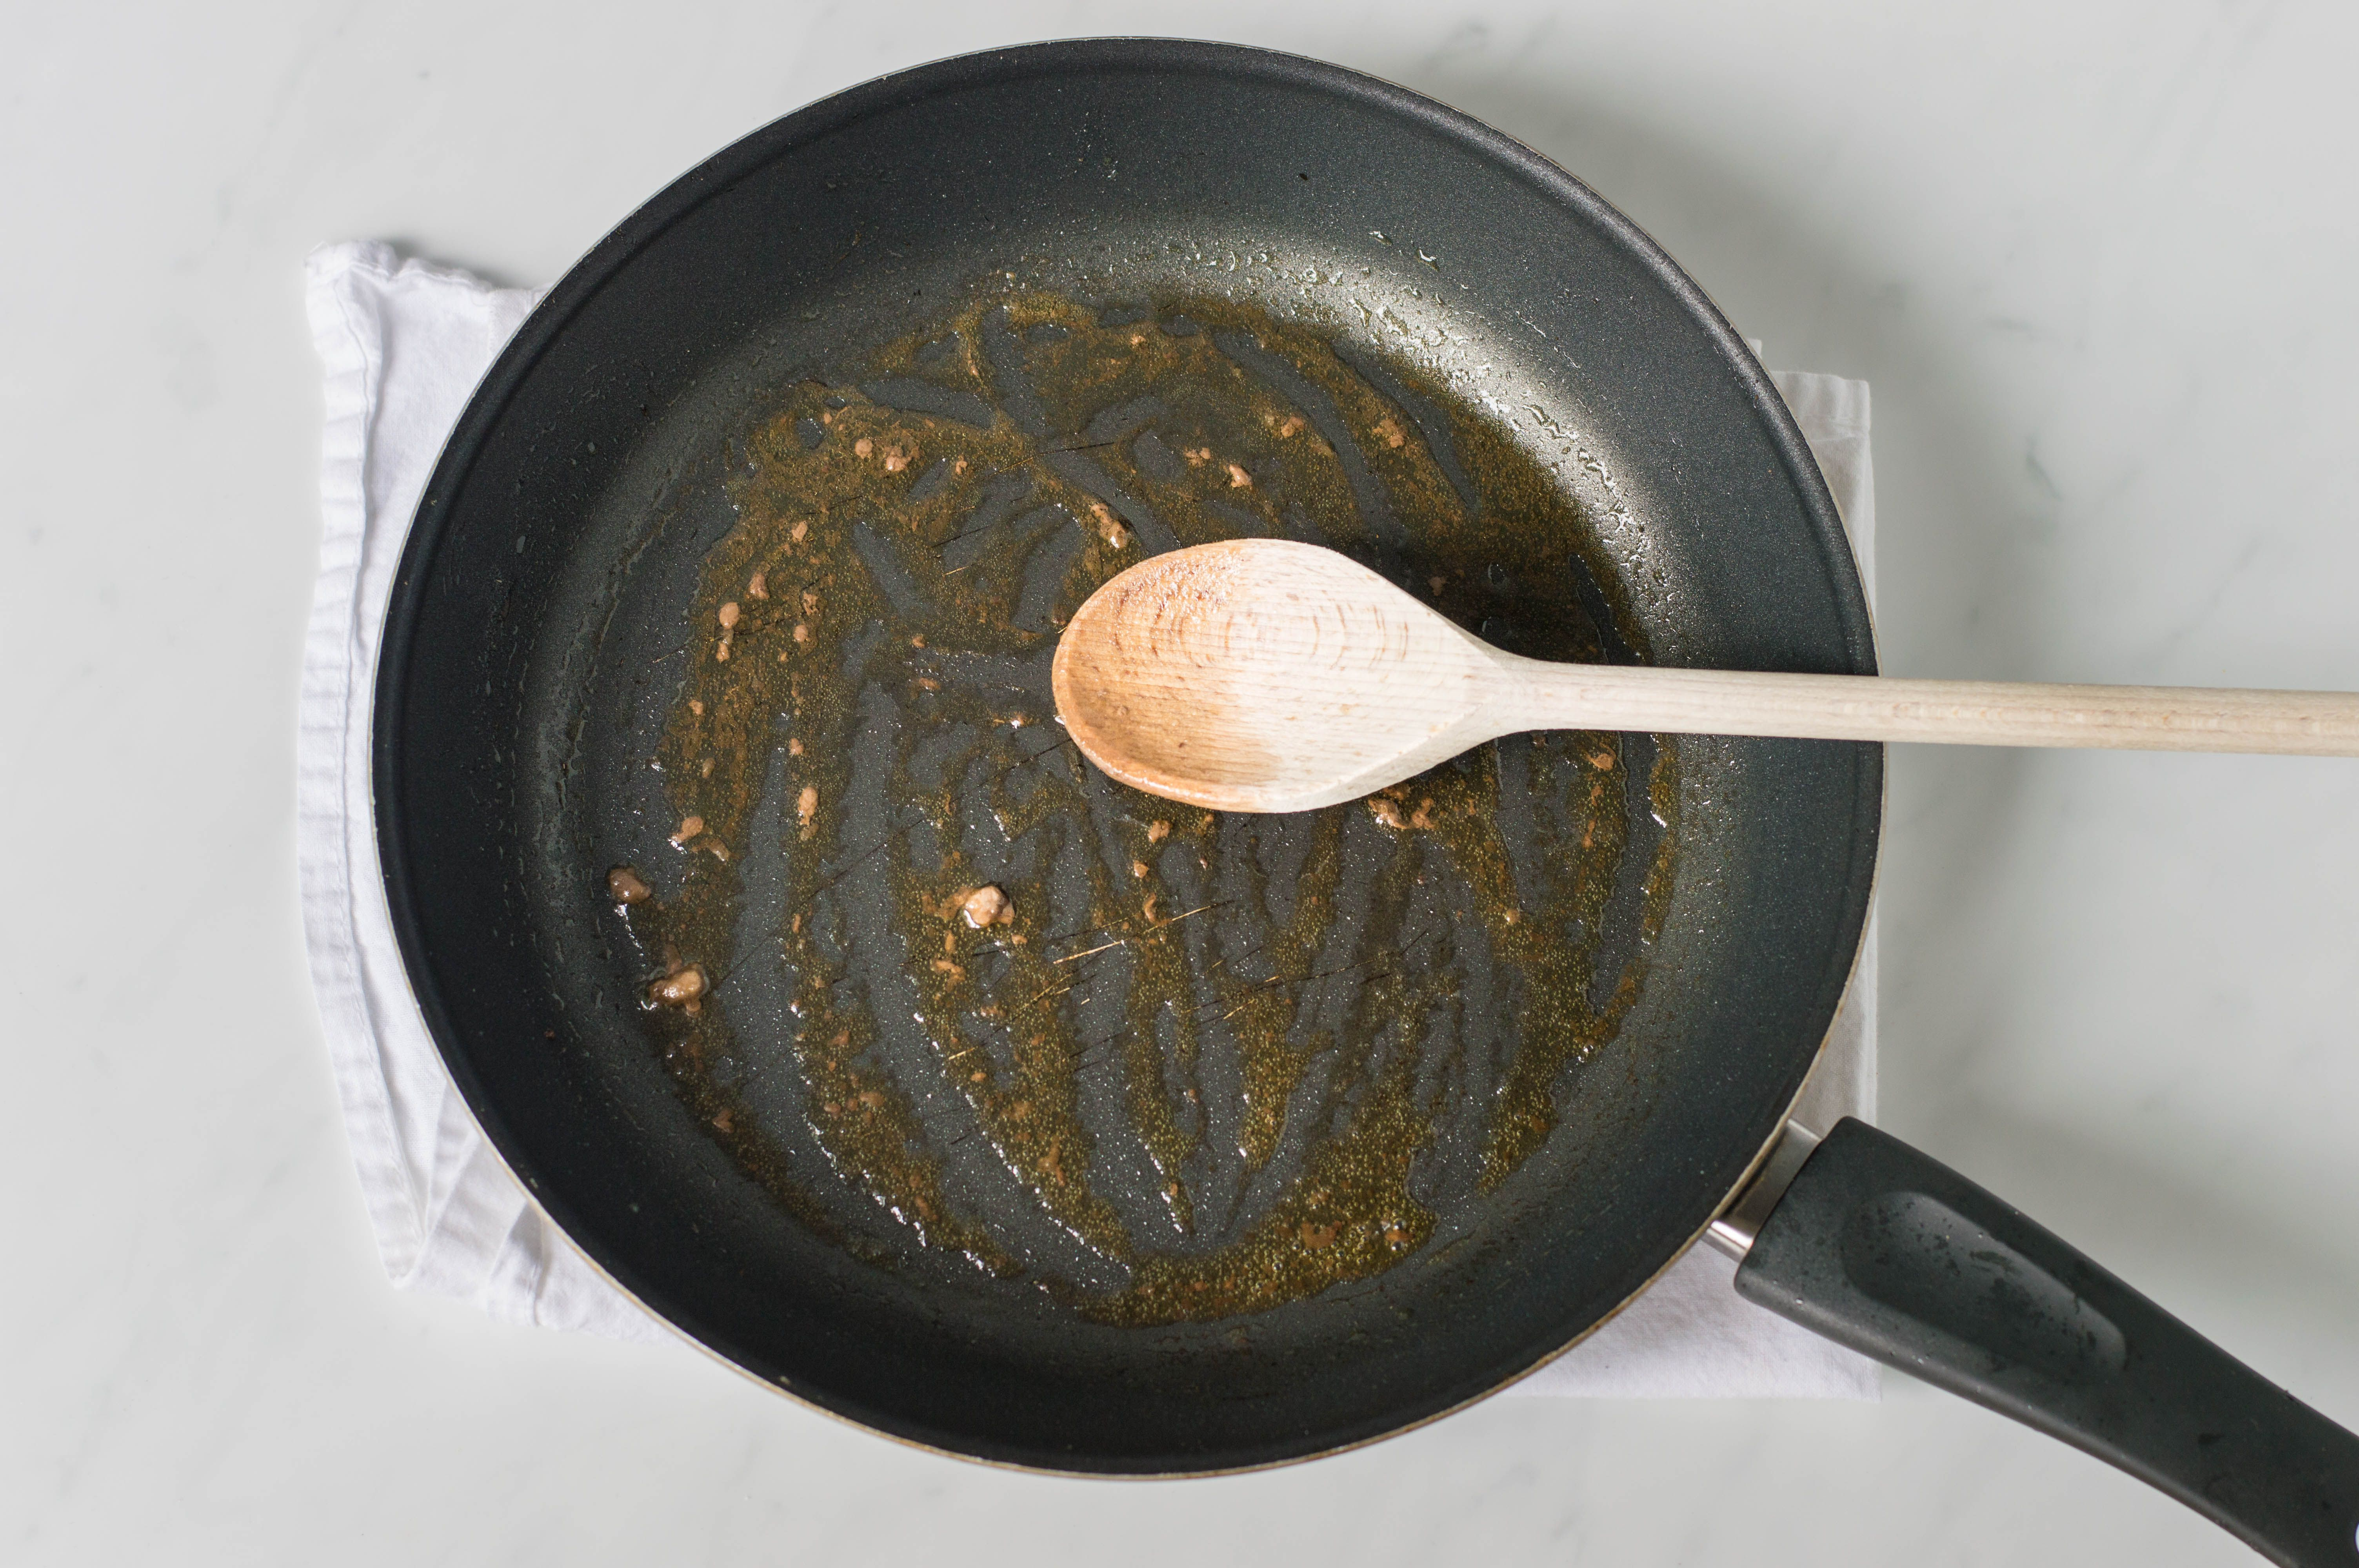 Pan drippings